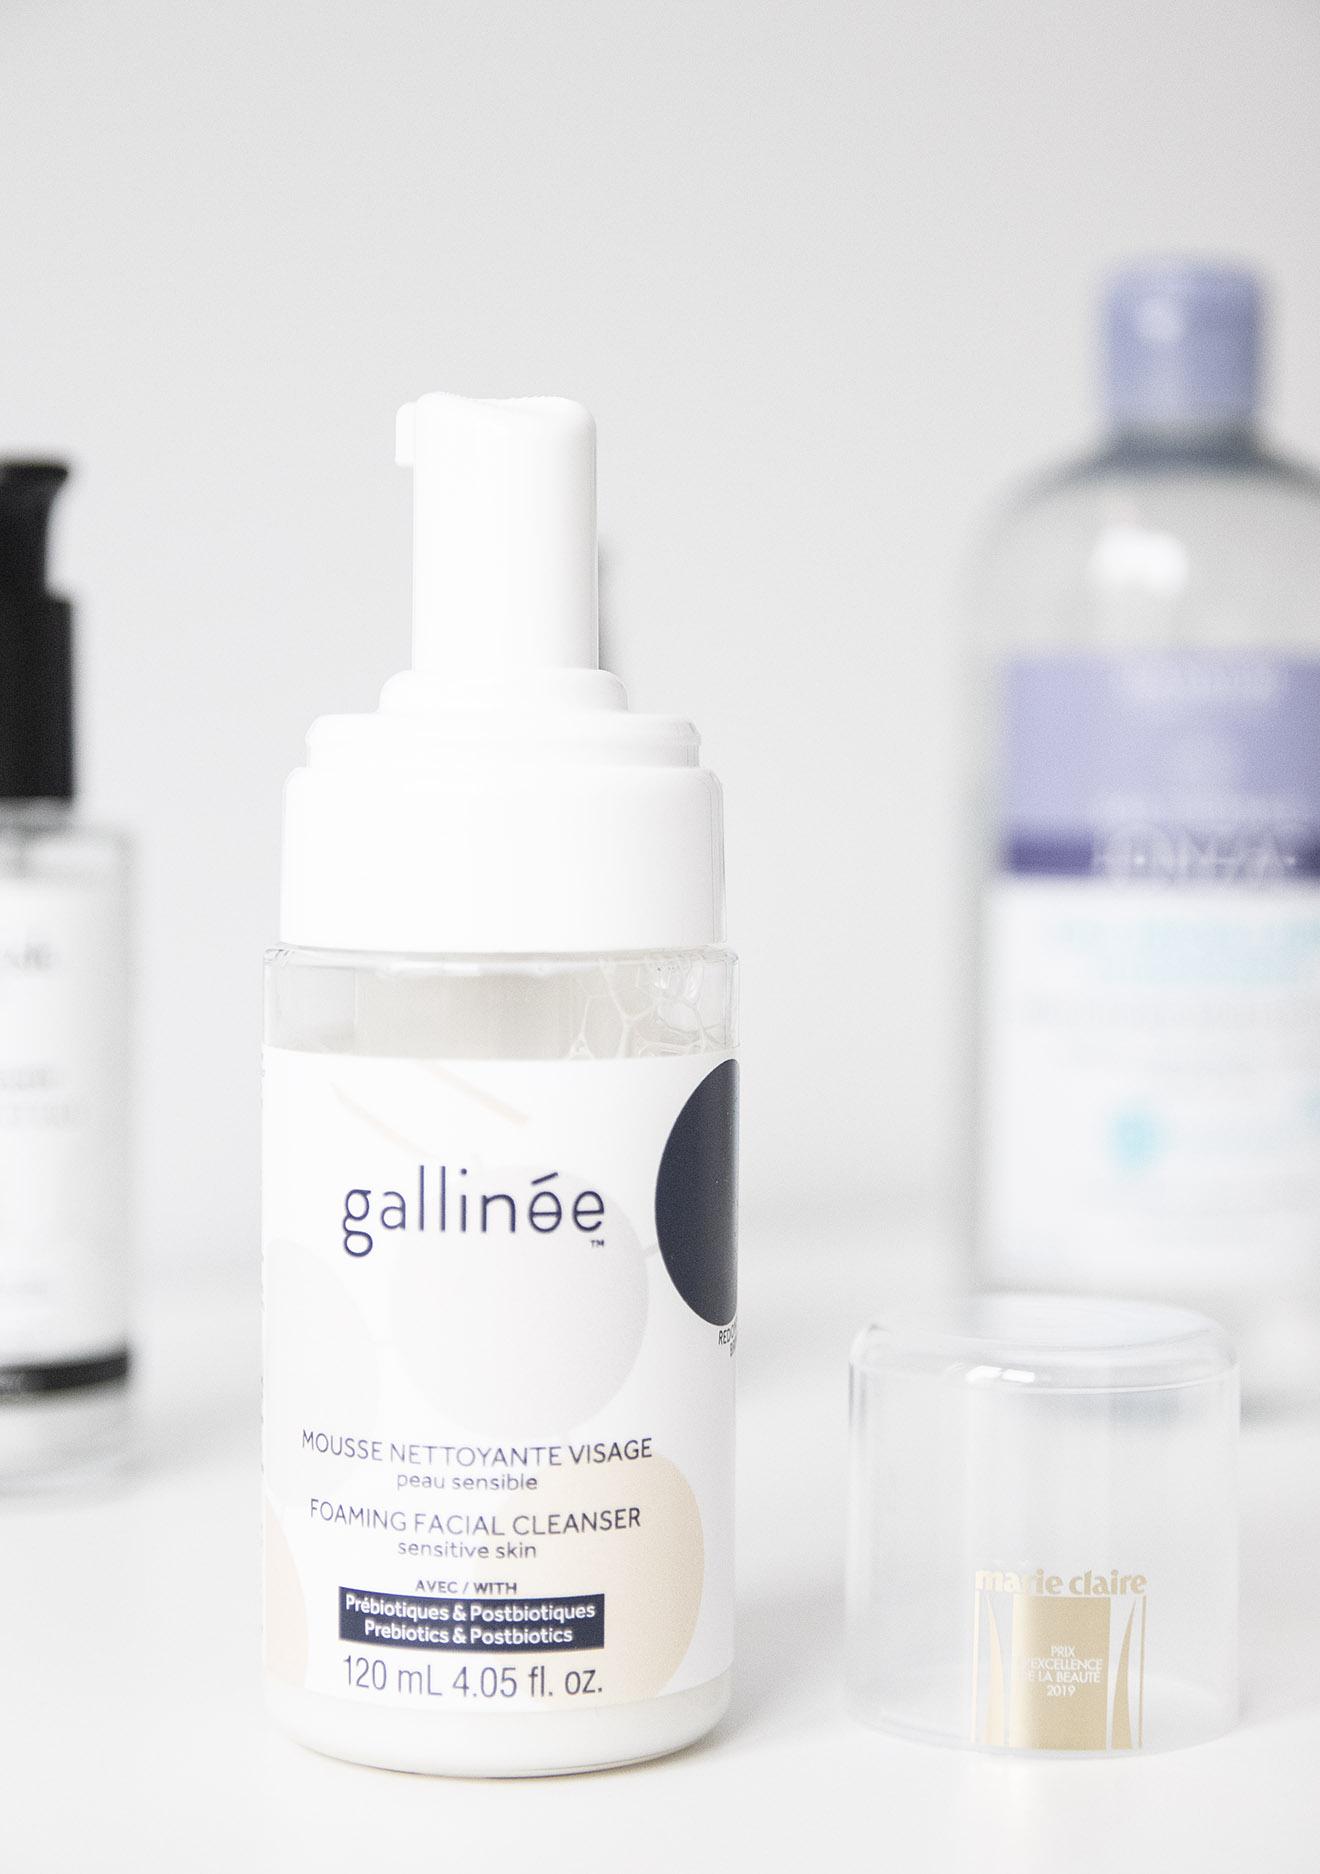 Gallinee Probiotic Foaming Facial Cleanser